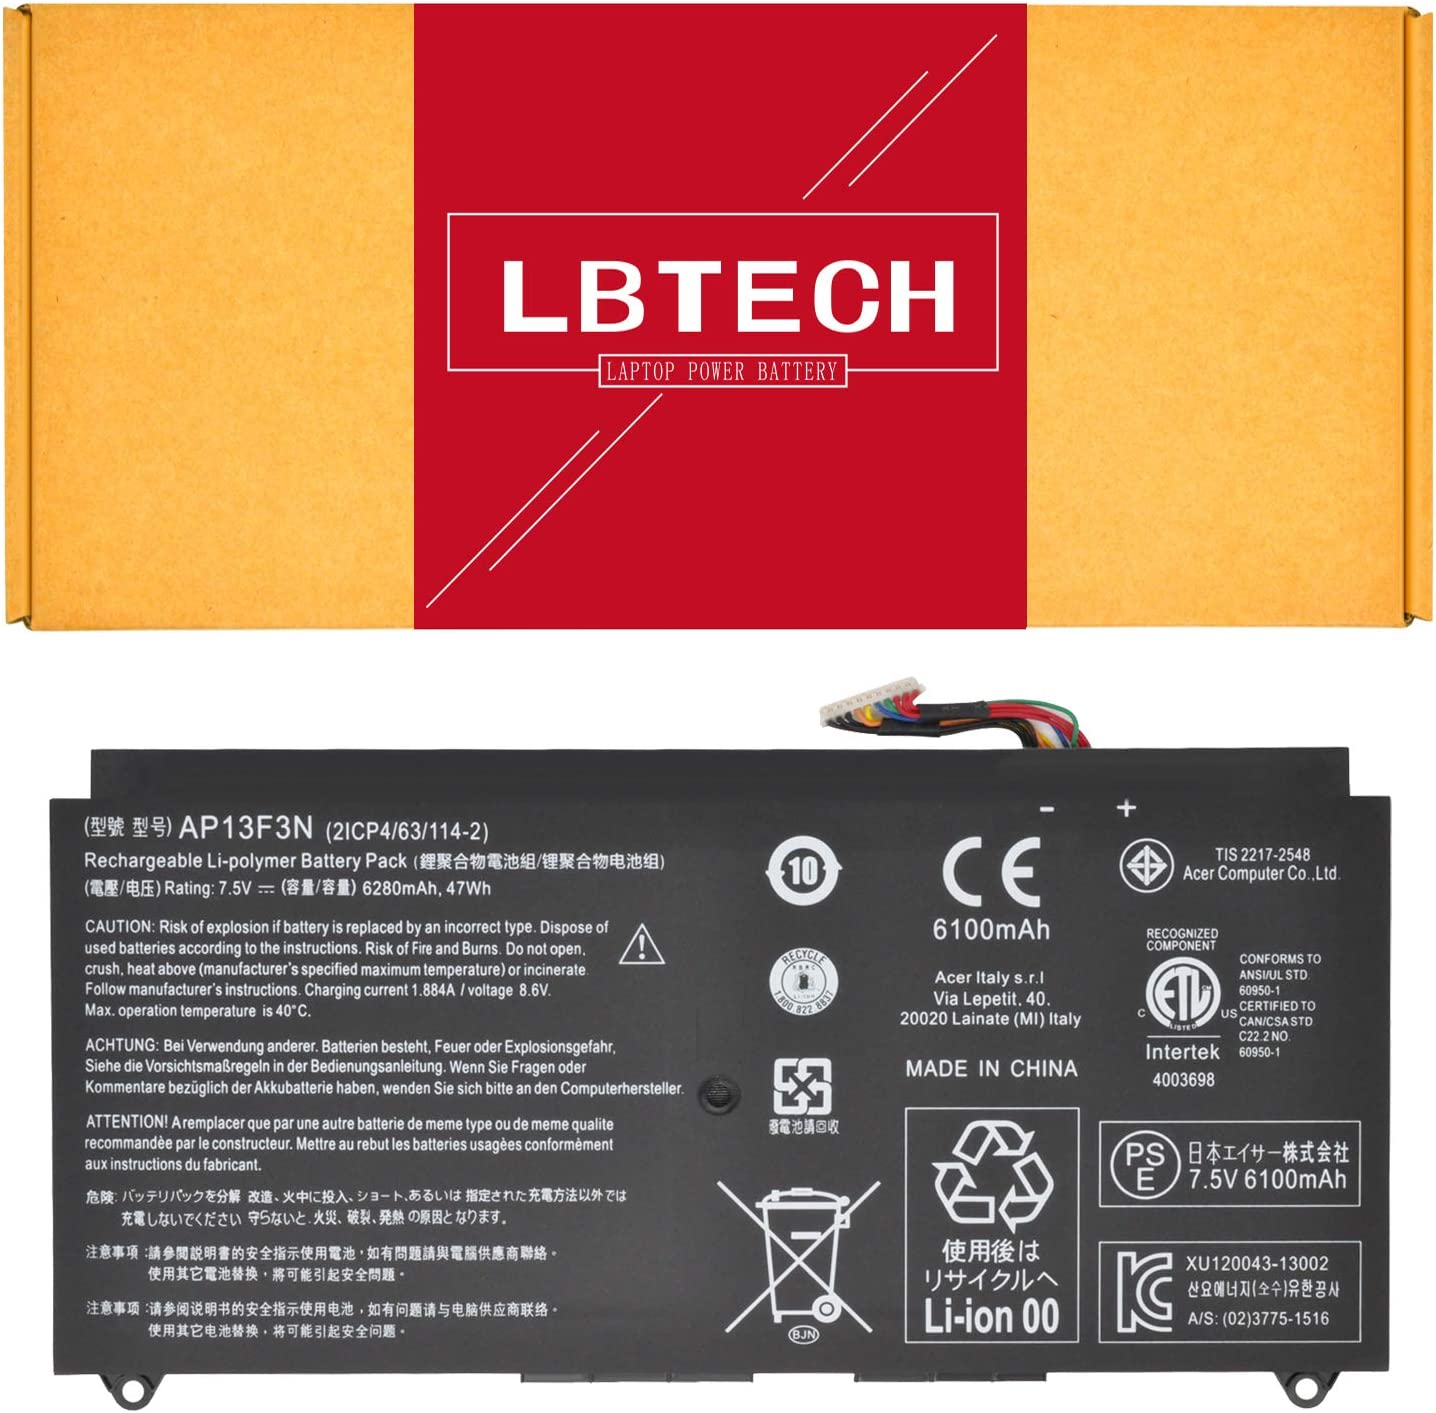 LBTECH 7.5V 47Wh 6280mAh AP13F3N Laptop Battery Replacement for Acer Aspire S7-391 S7-392 S7-392-54208g12tws S7-392-54208g25tws S7-393 Series Notebook